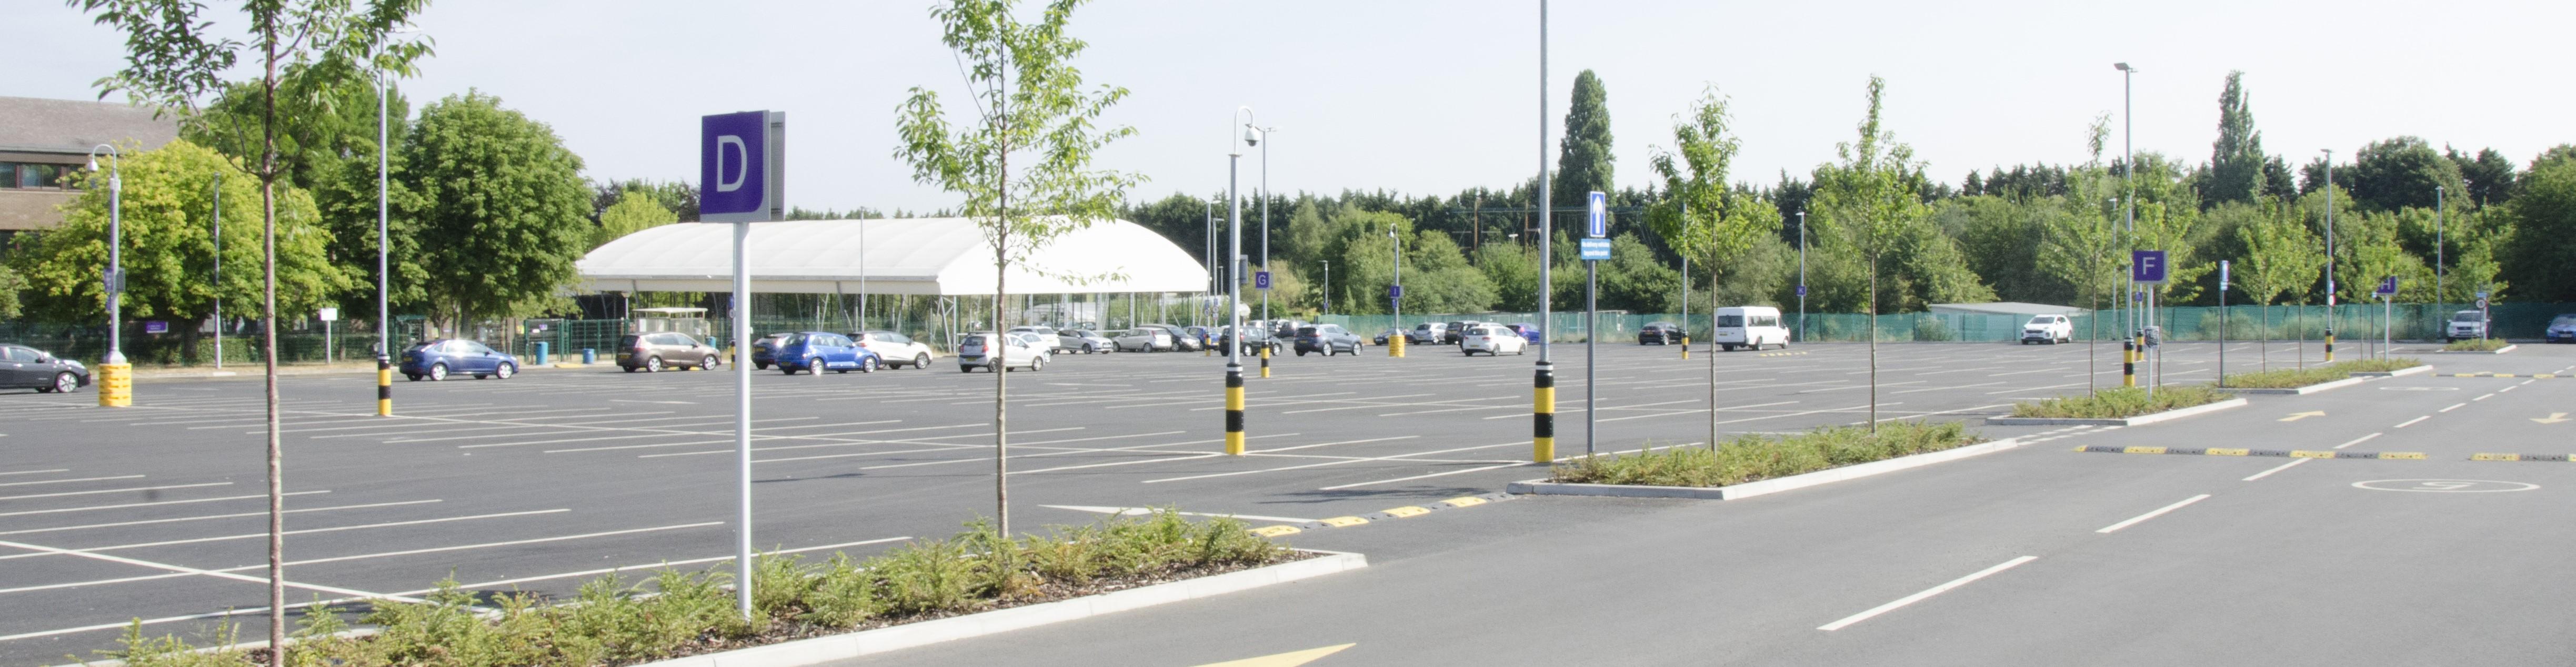 Commuter Parking & Day Nursery